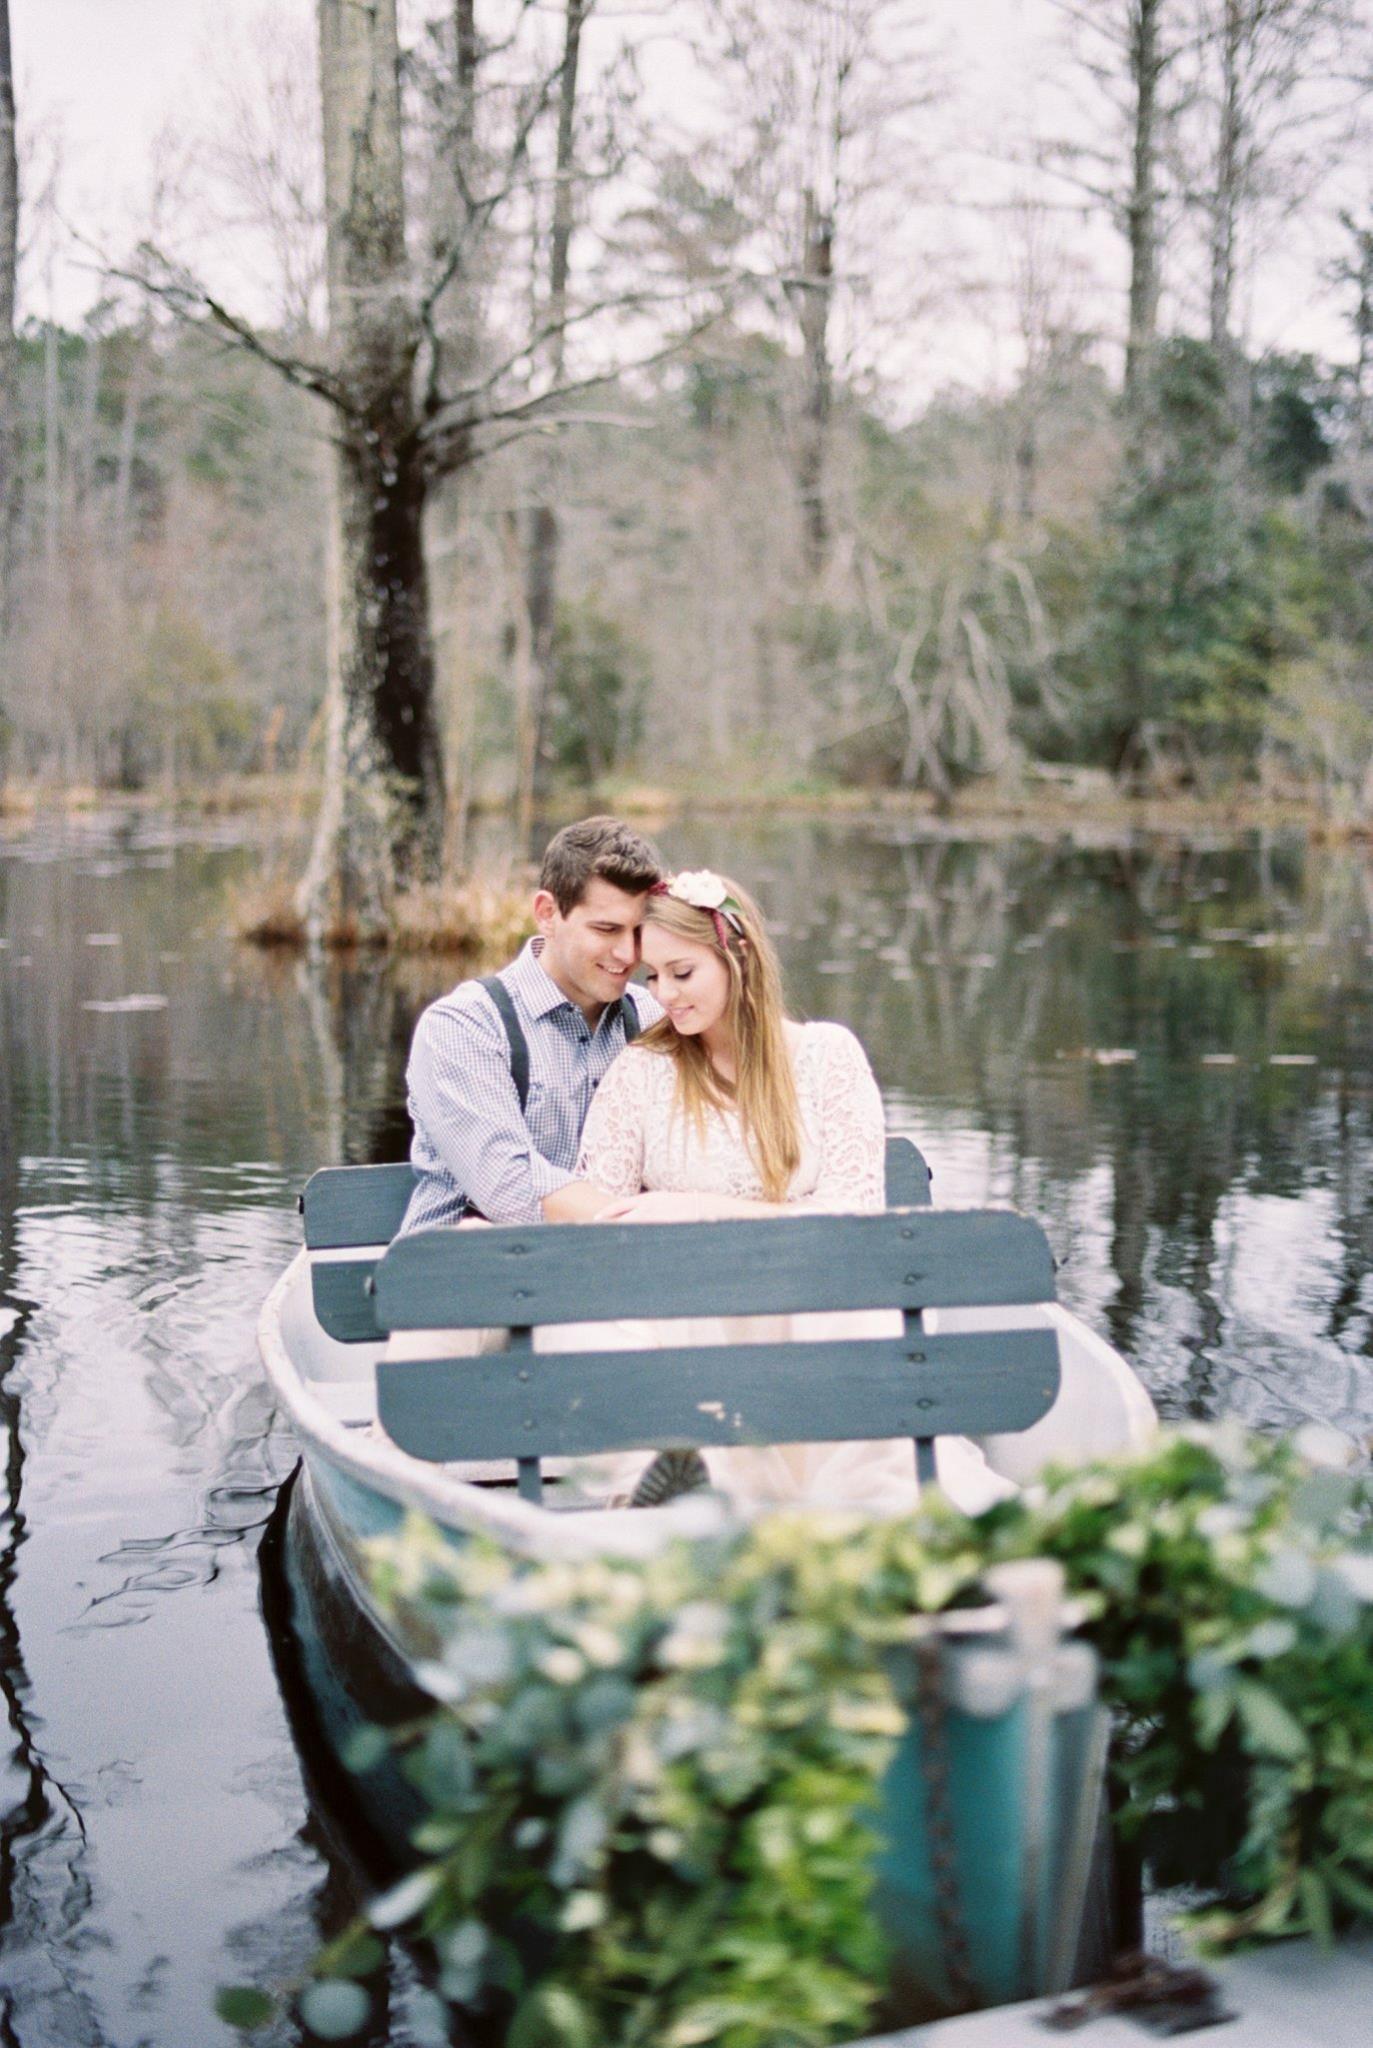 Charleston Wedding Love At Cypress Gardens Thenotebook Weddings Photo By Becky Frisina Williamson